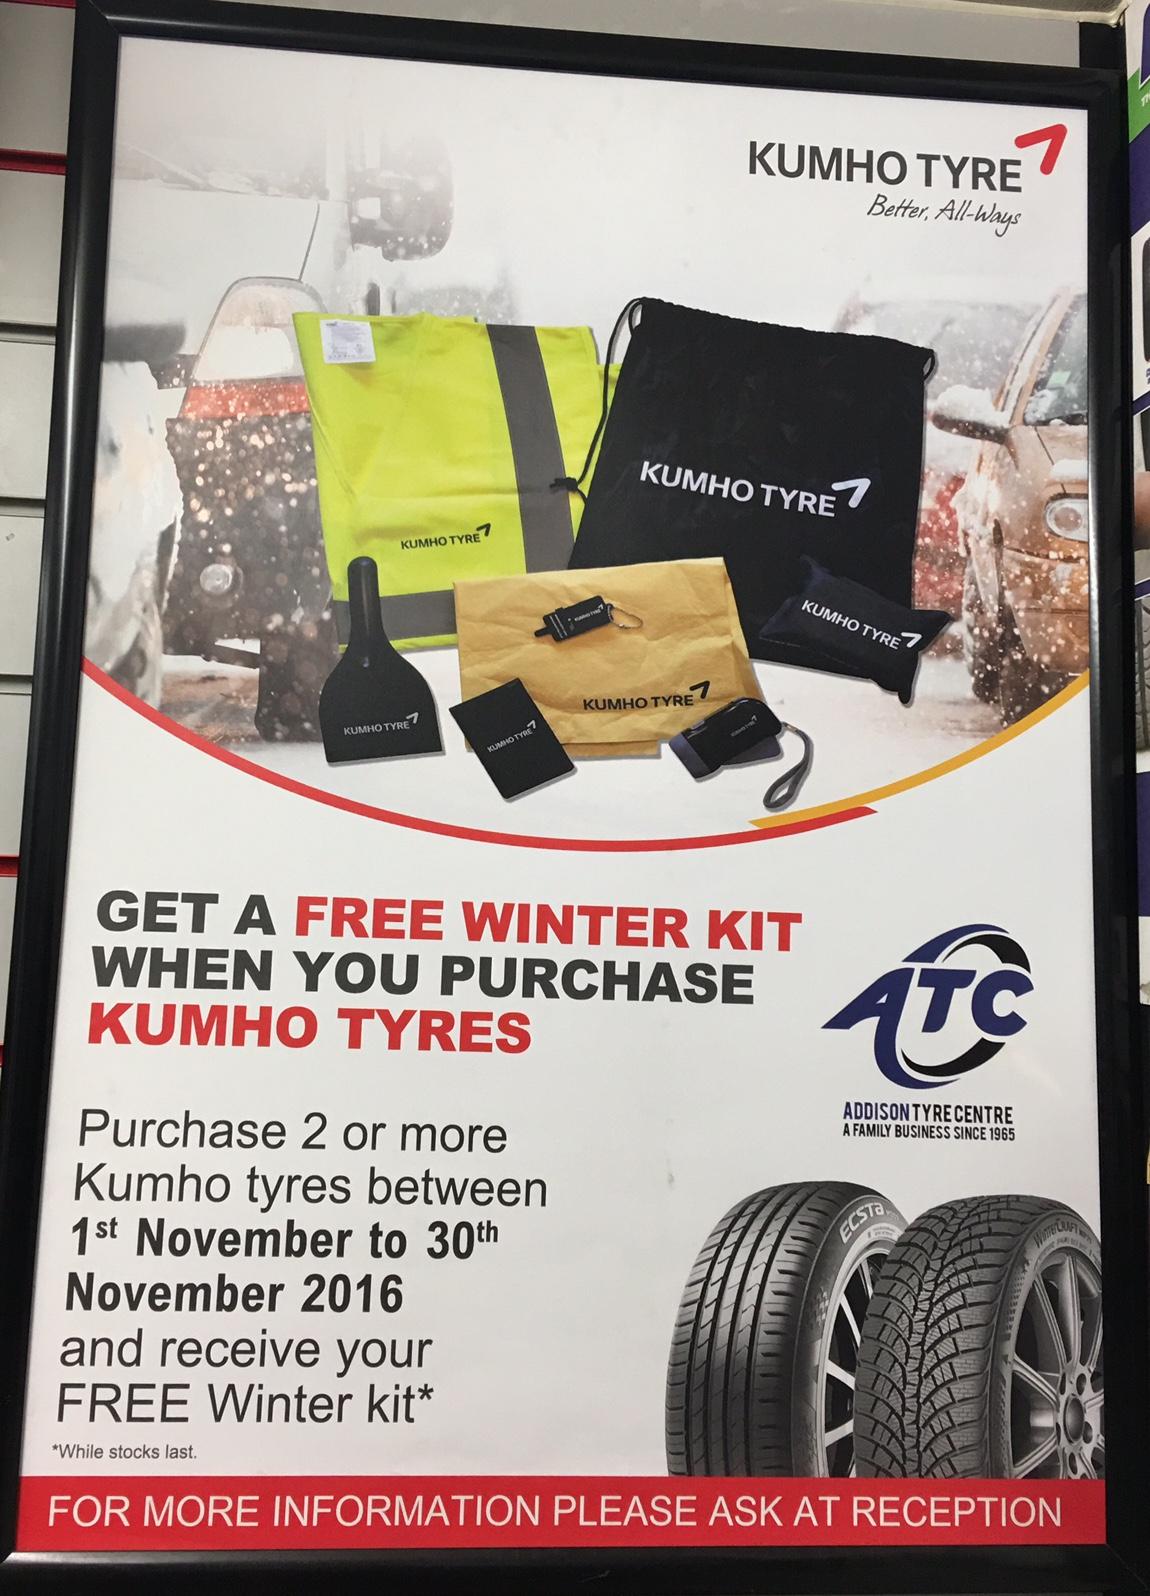 Kumho free winter kit while stocks last